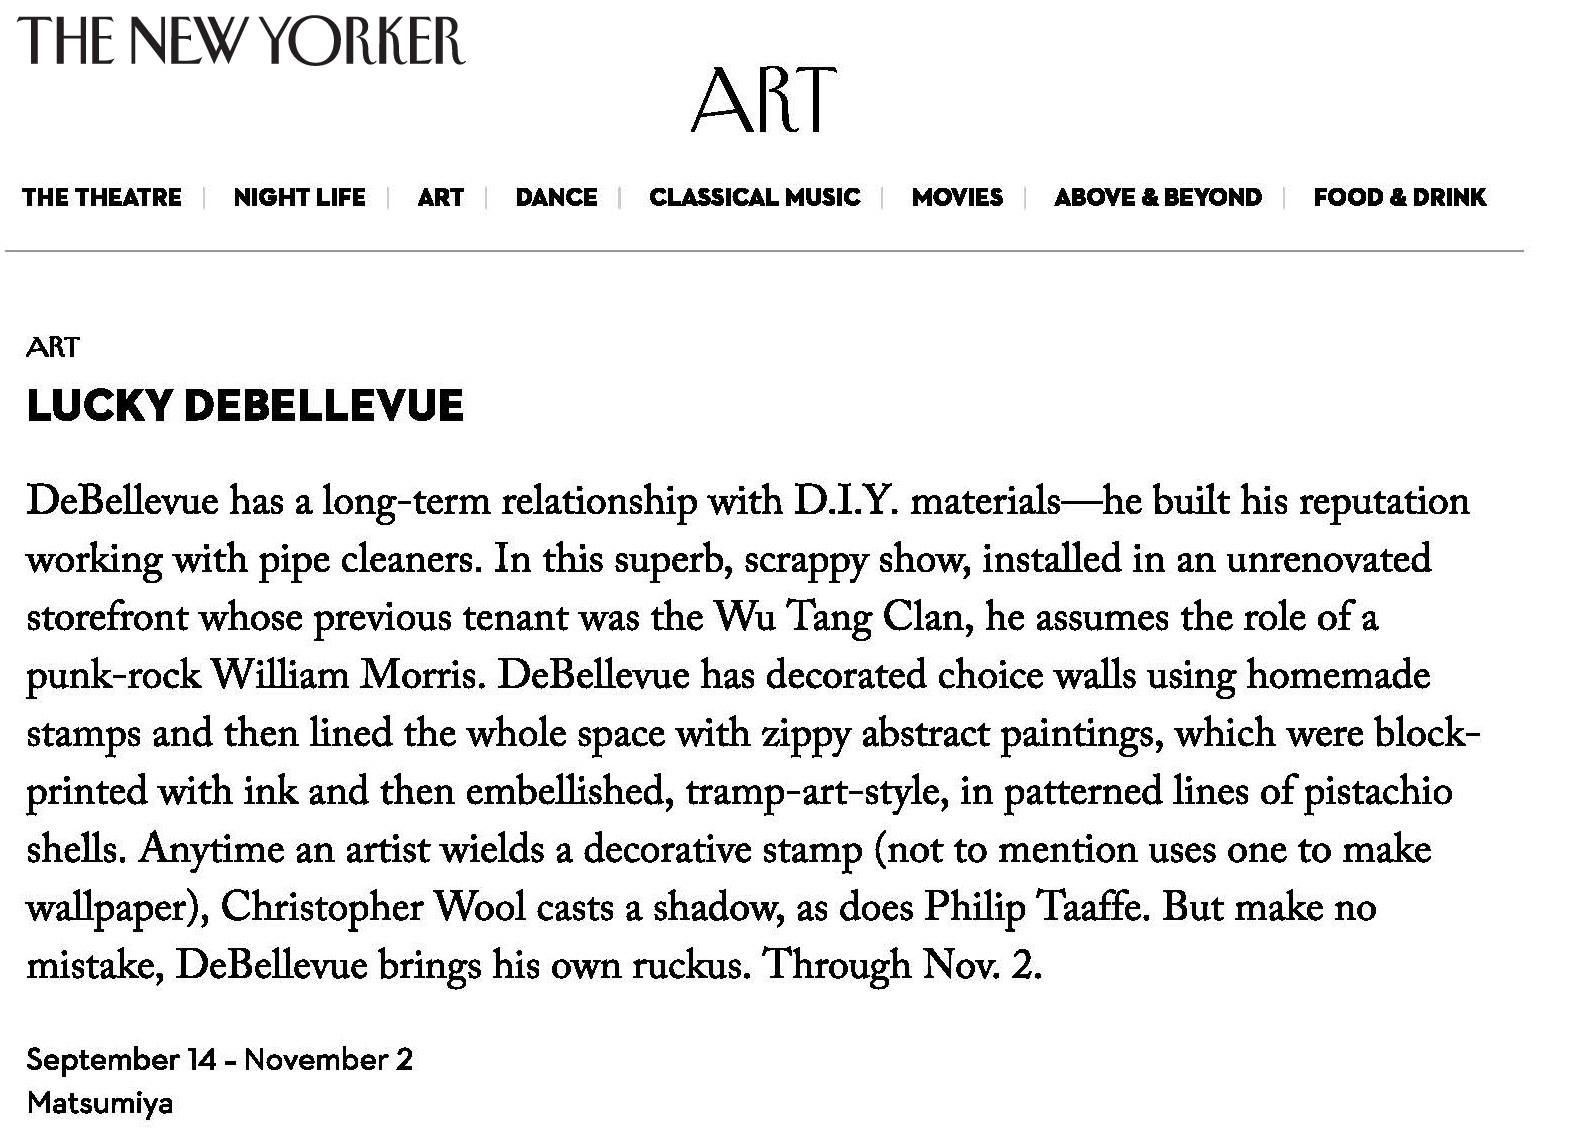 Lucky DeBellevue - The New Yorker.jpg